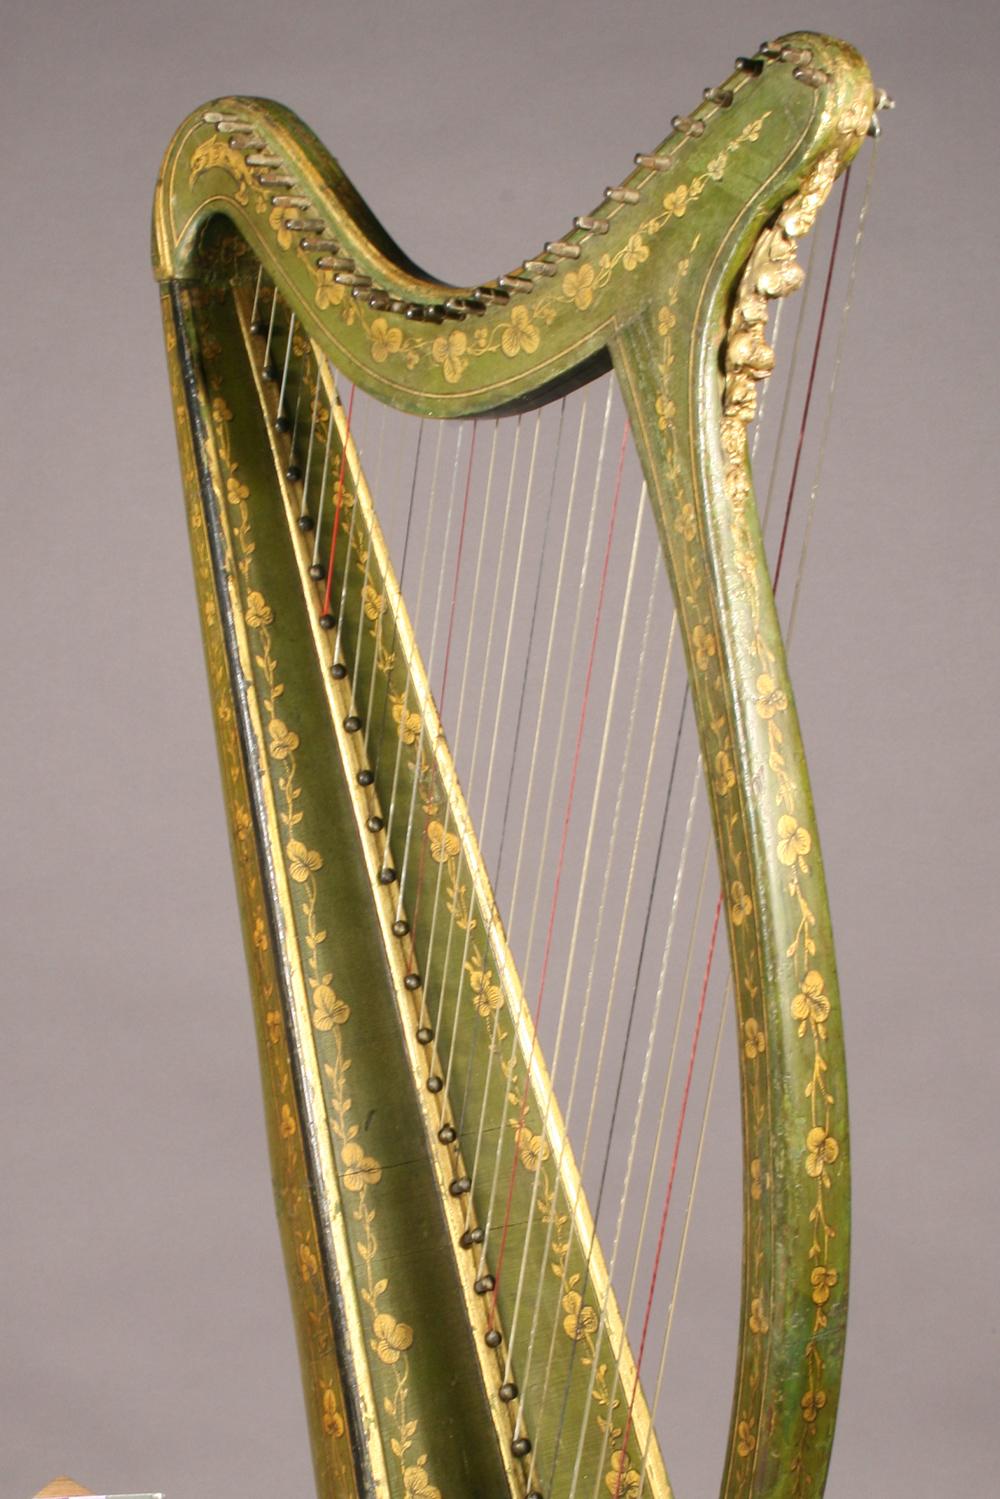 Historic Irish harp with polychrome details